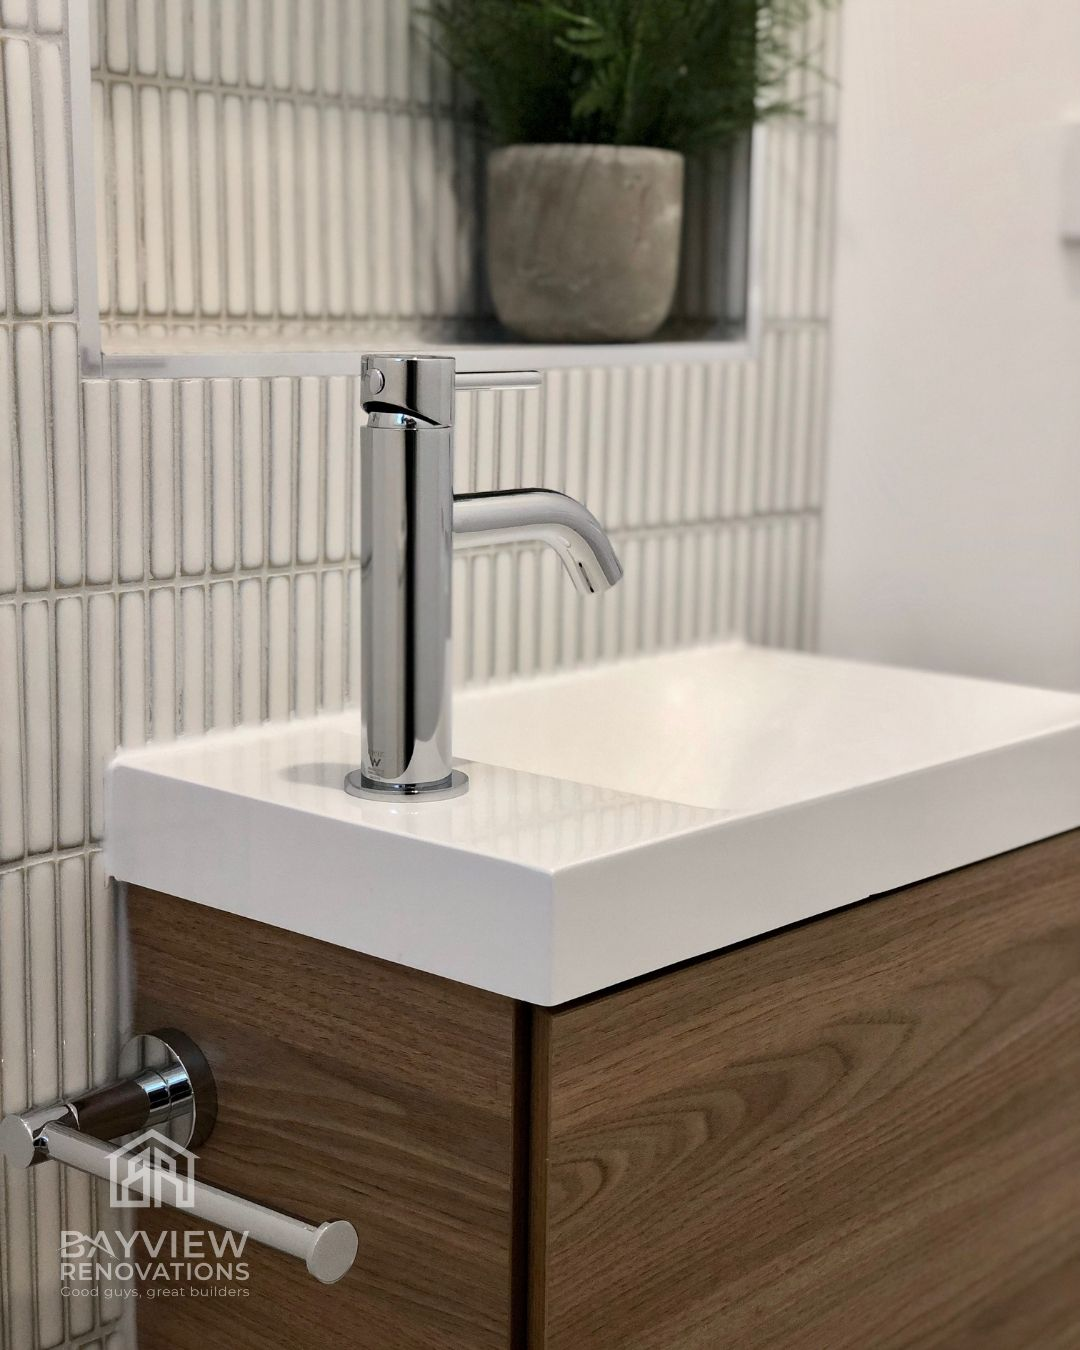 Bathroom Basin Renovations - Bayview Renovations